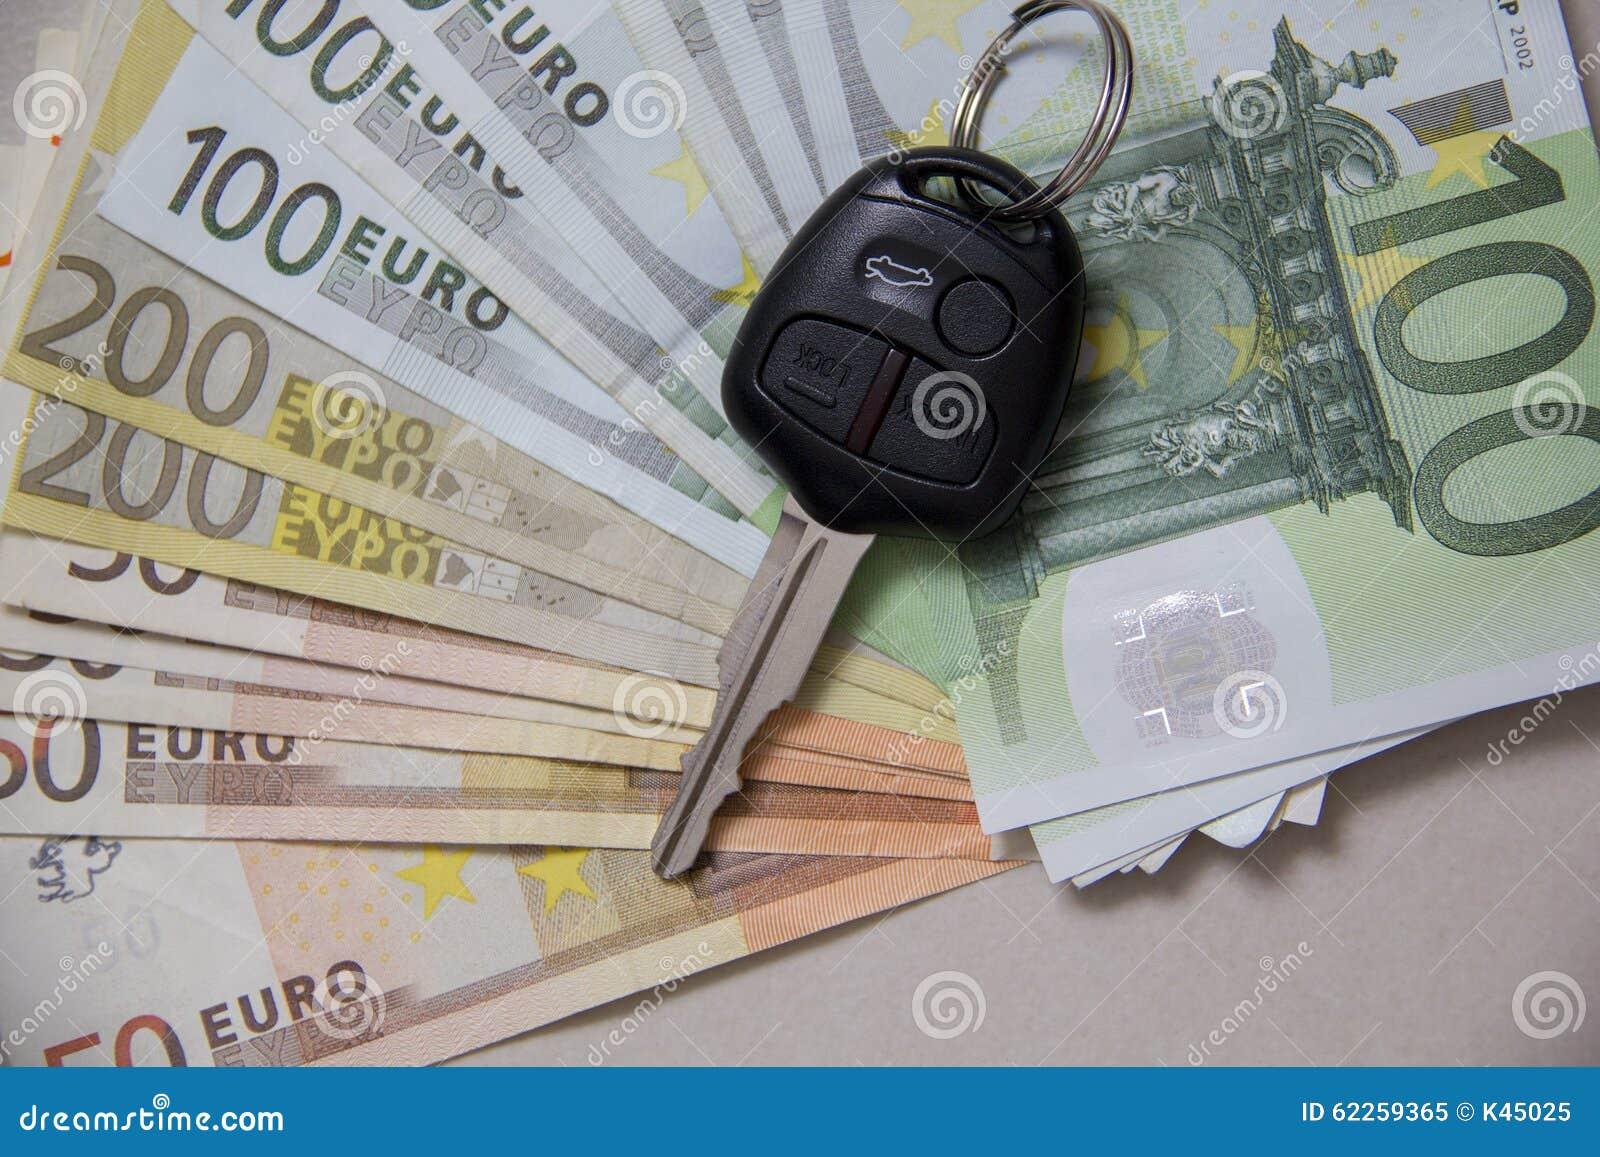 Car Keys On Euro Banknotes Flat Lay Stock Image Image Of